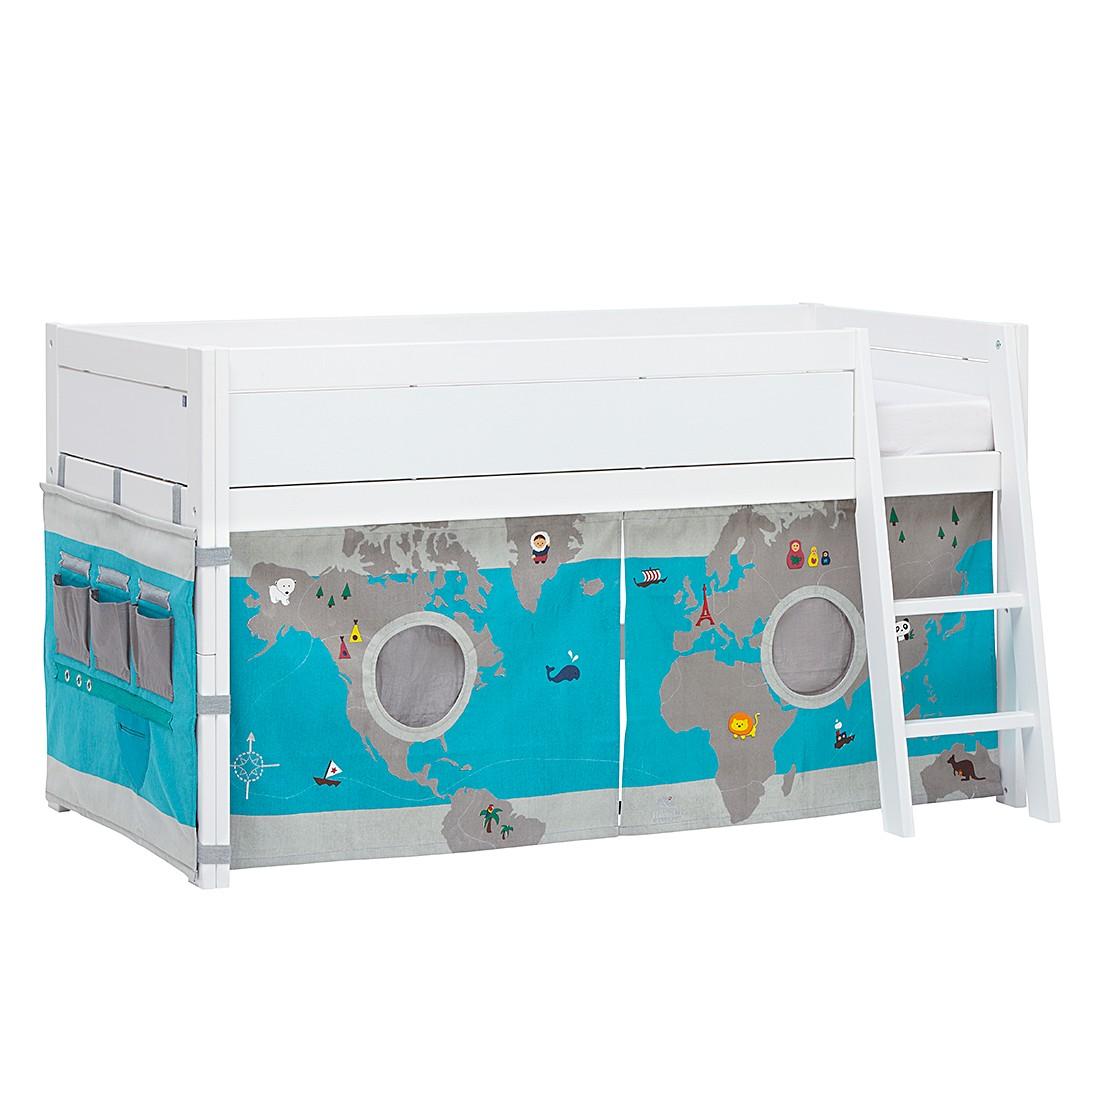 Halbhohes Bett Lifetime Original - Kiefer teilmassiv/Textil - Weiß/Bunt - Mit Deluxe Lattenrost, Lifetime Kidsrooms